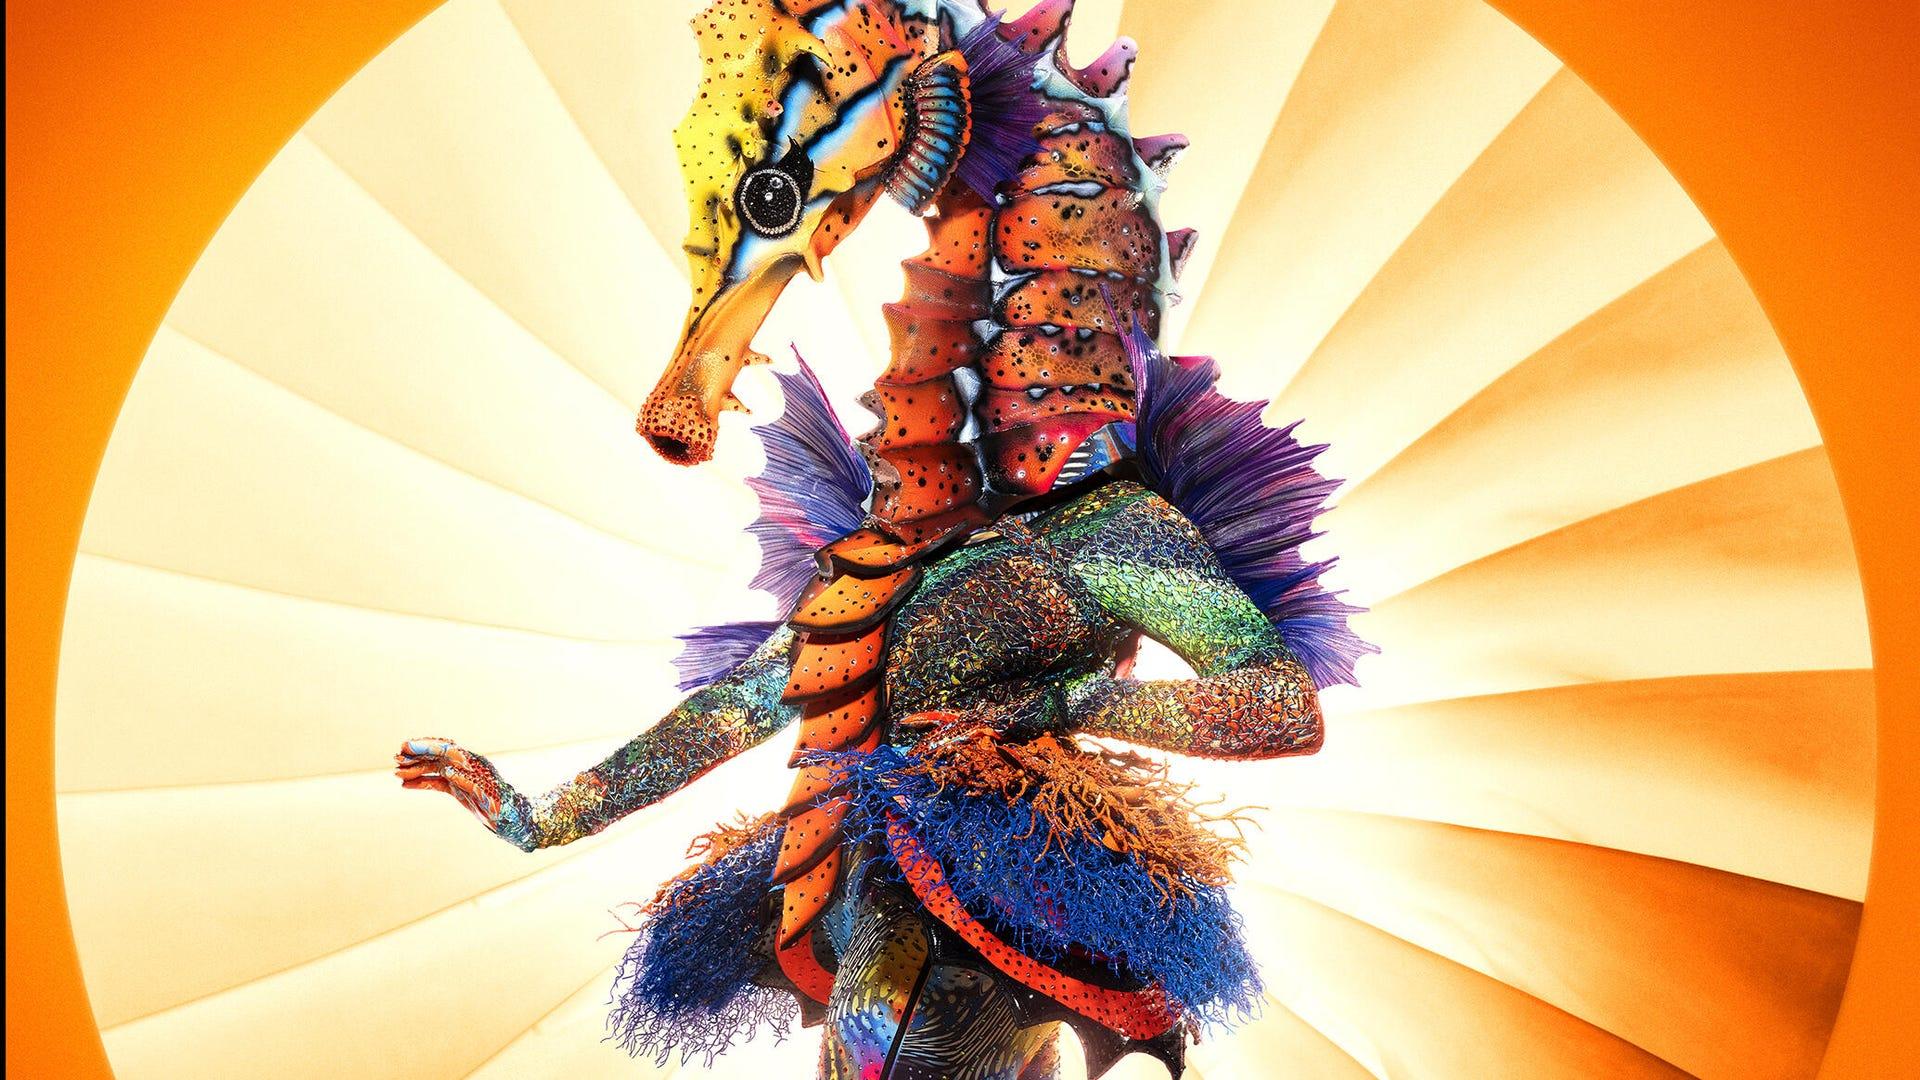 Seahorse, Masked Singer